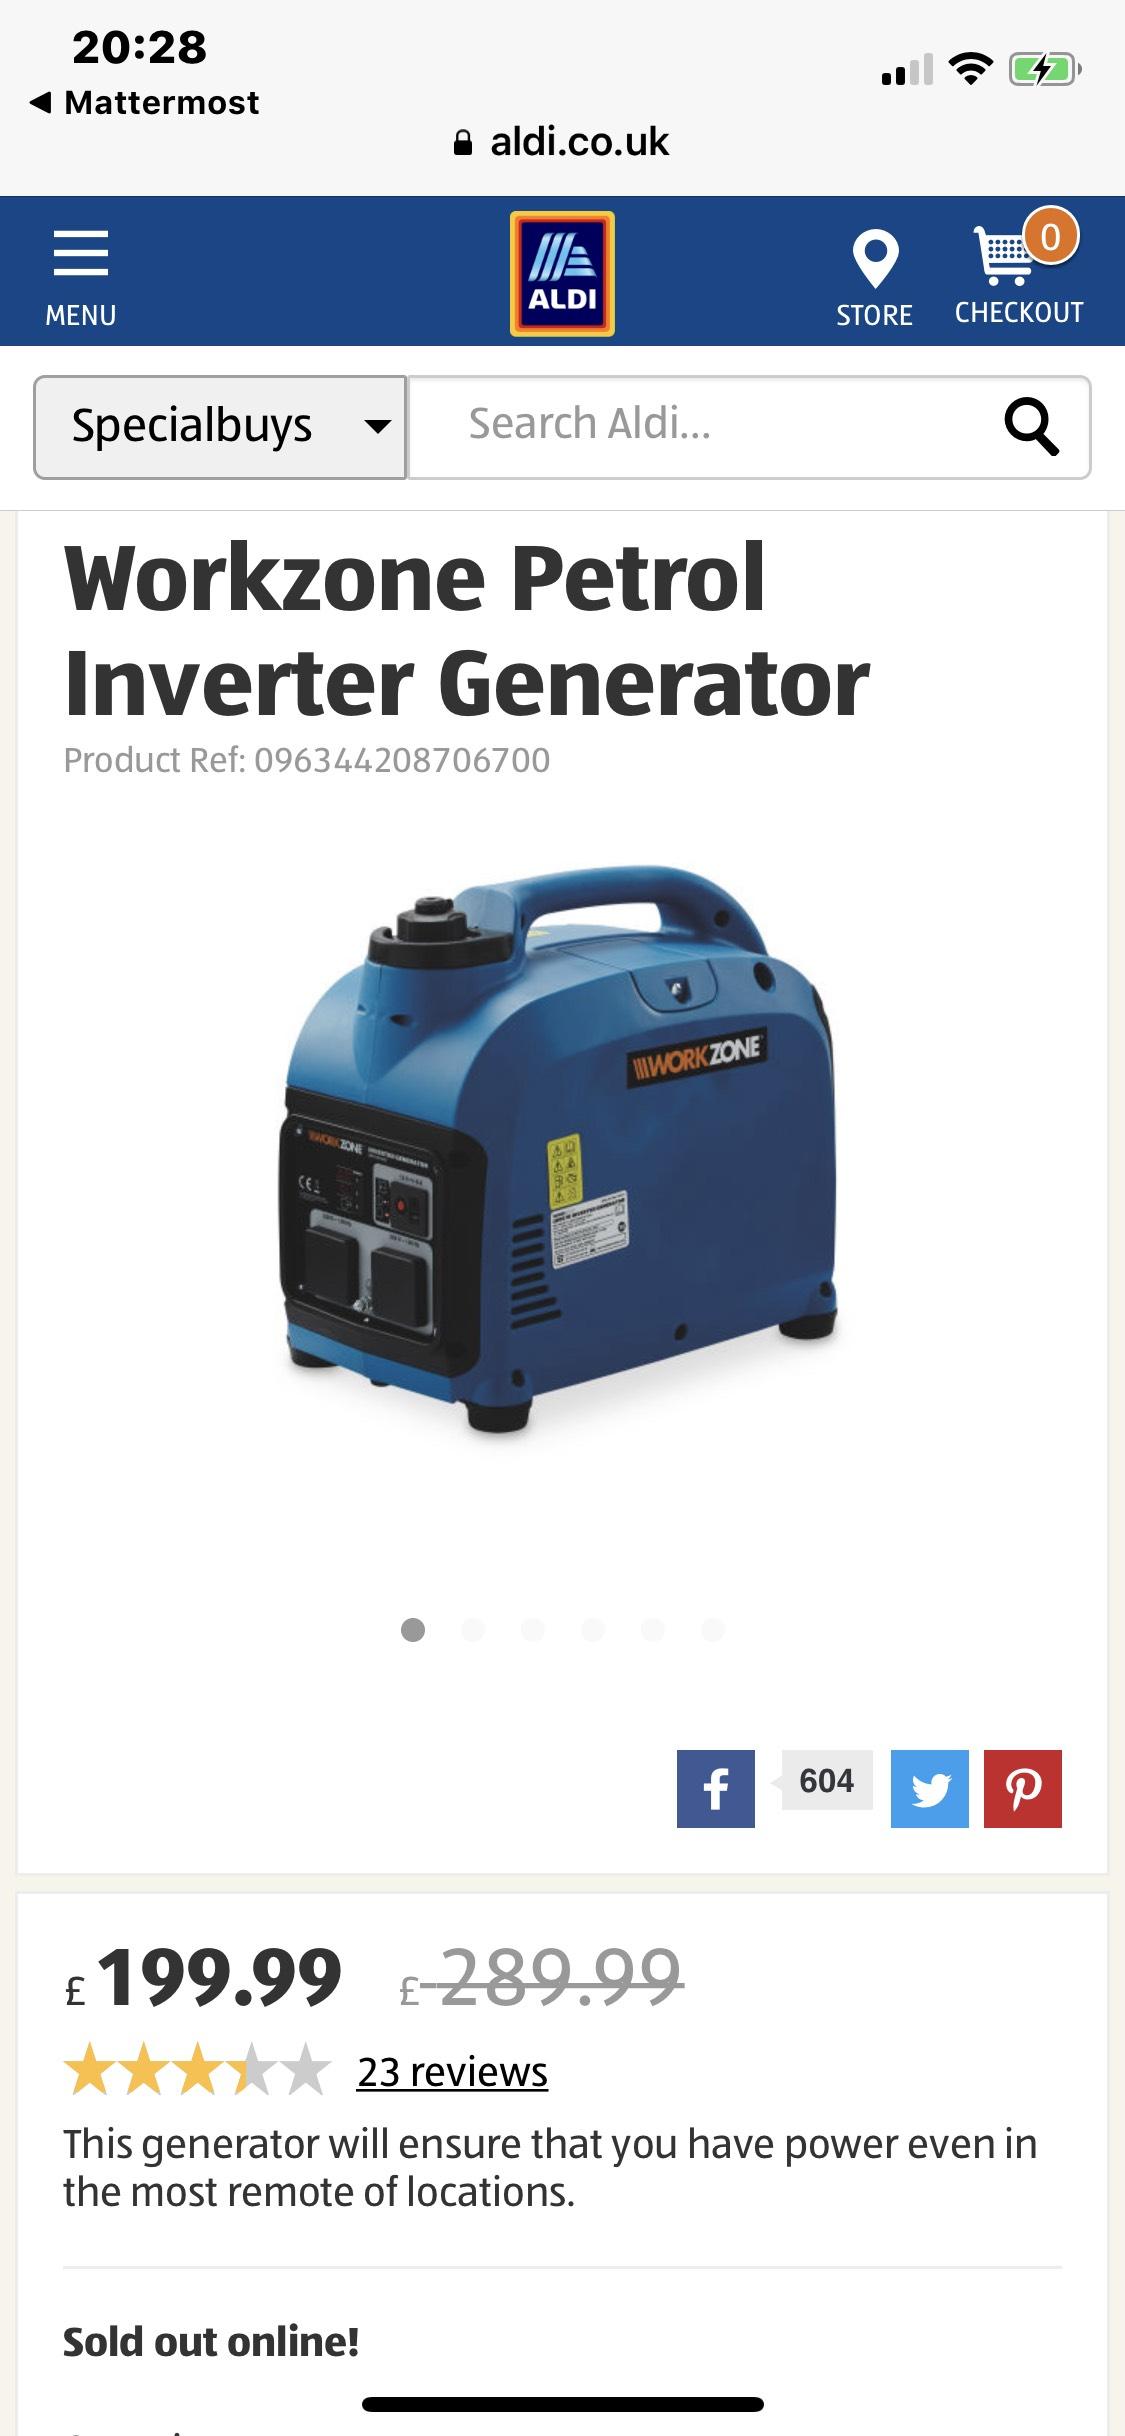 Workzone Petrol Inverter Generator £199.99 @ Aldi